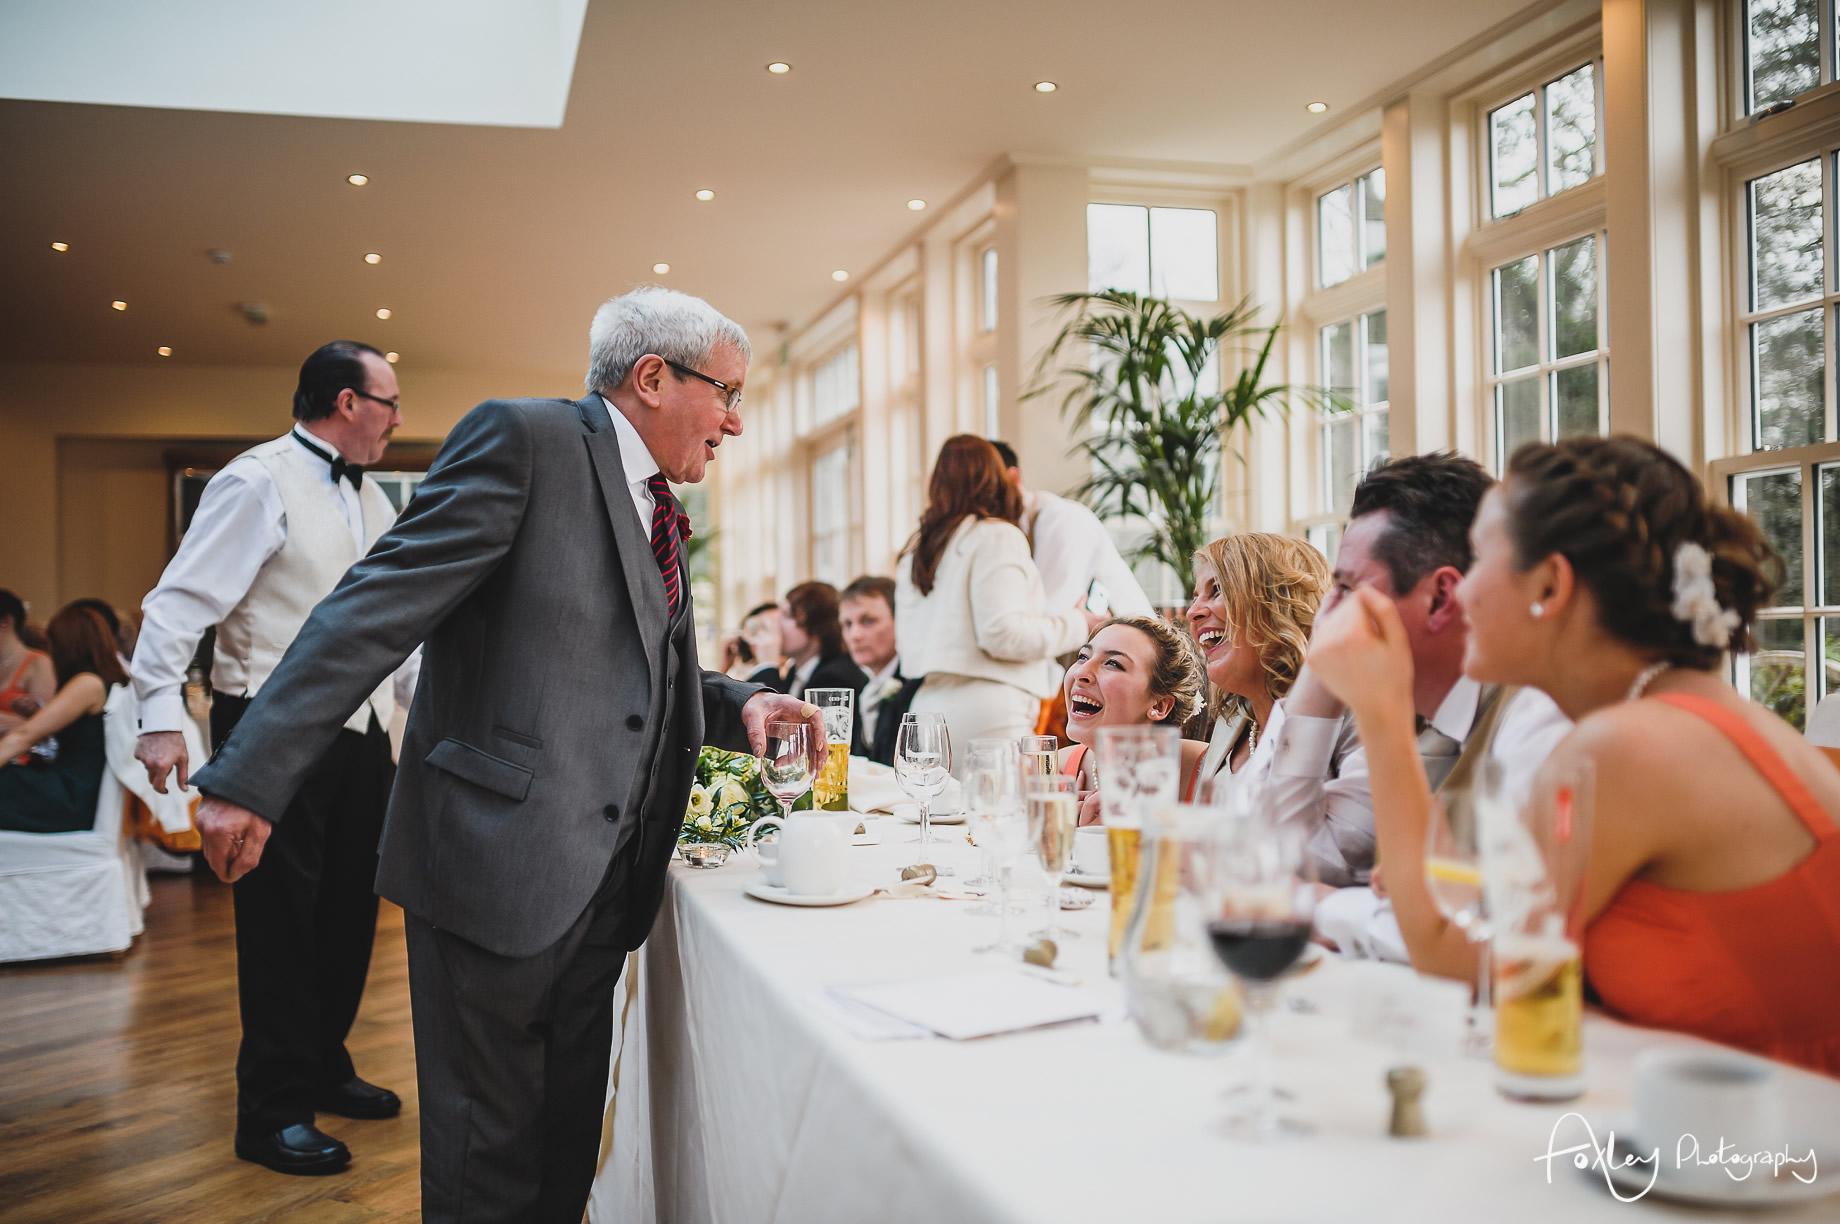 Gemma and Lewis' Wedding at Mitton Hall 125